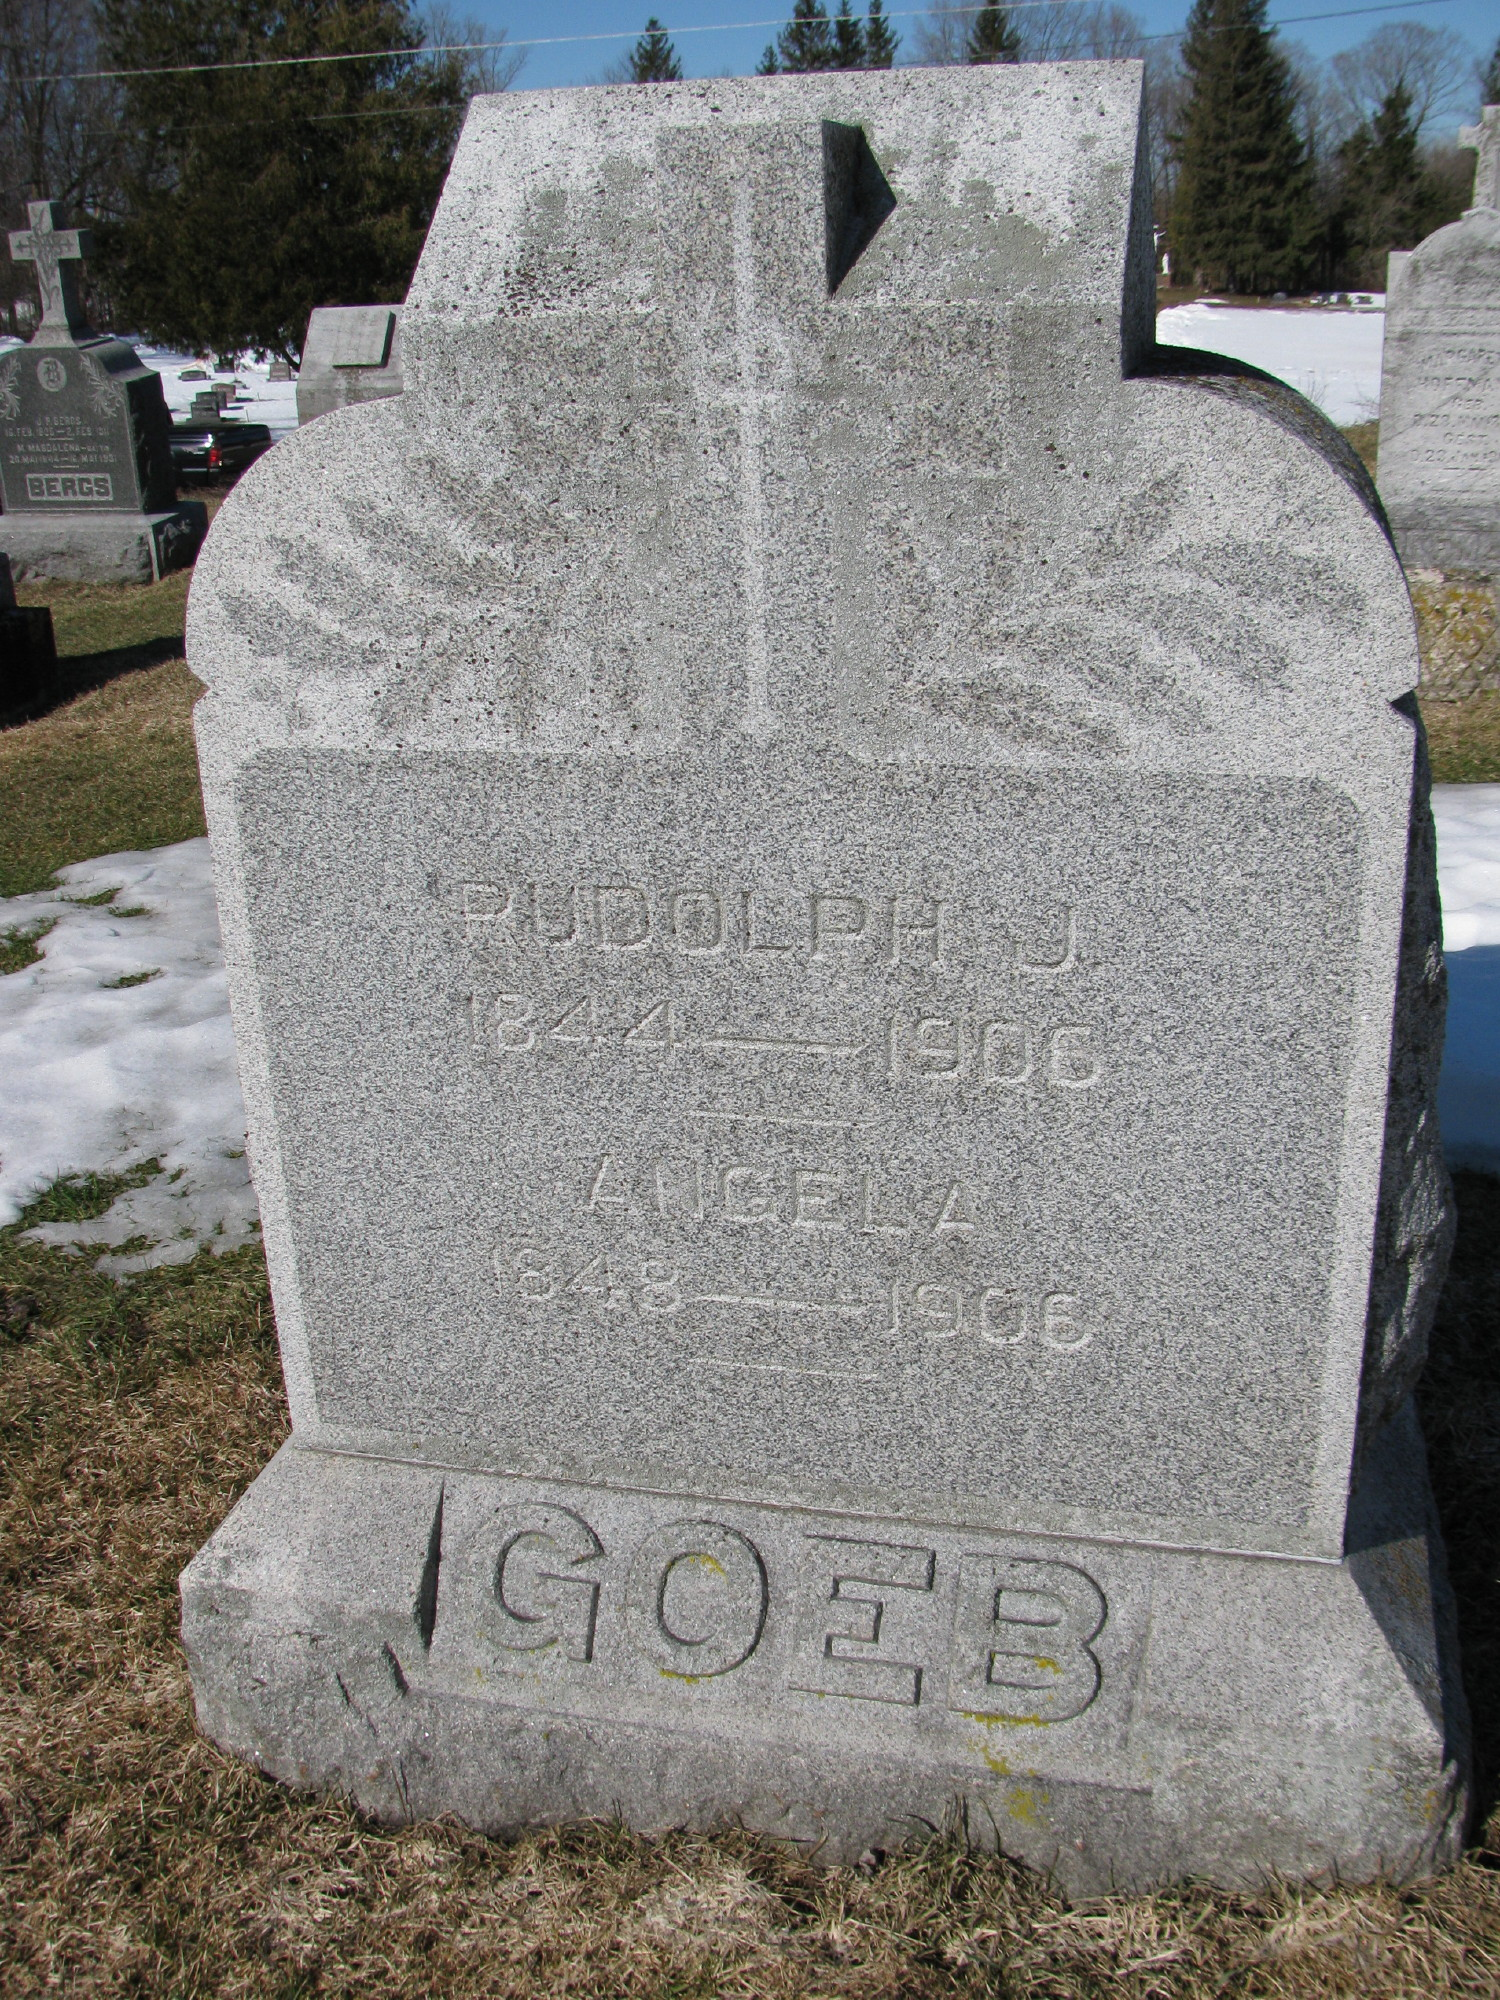 Rudolph Joseph Goeb